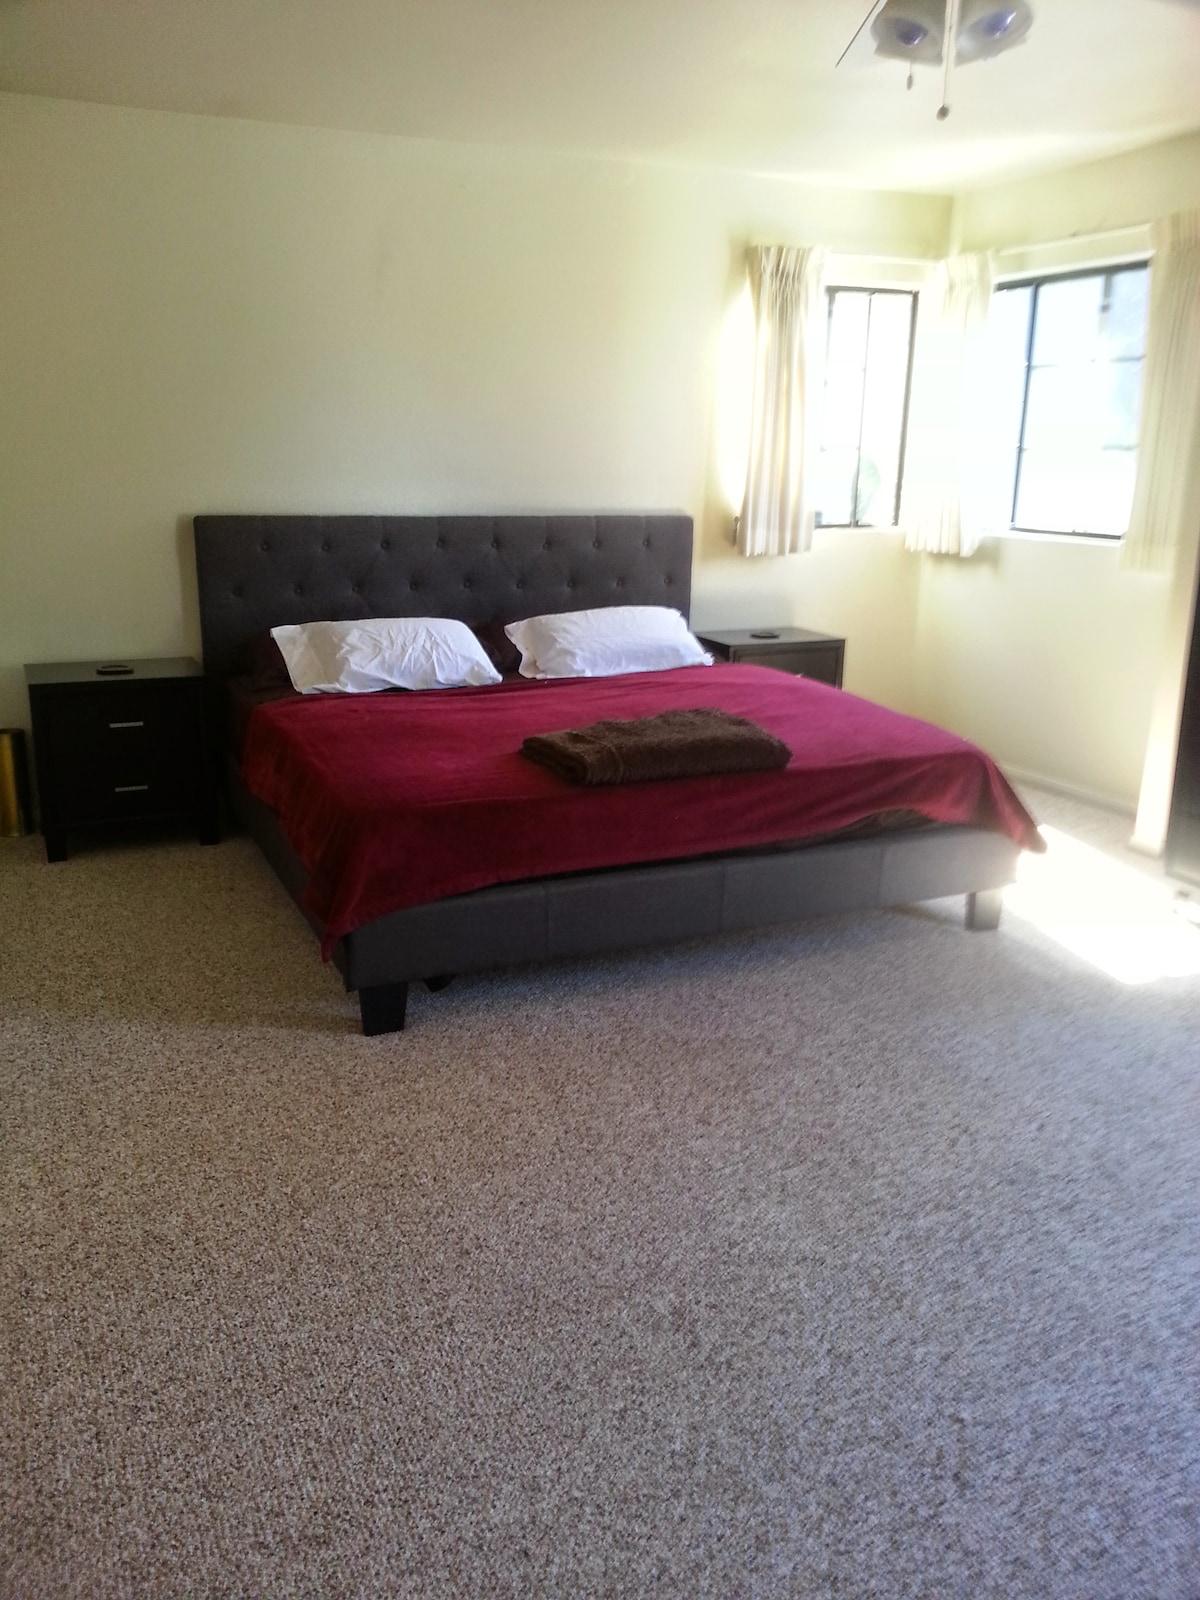 King size en suite master bedroom